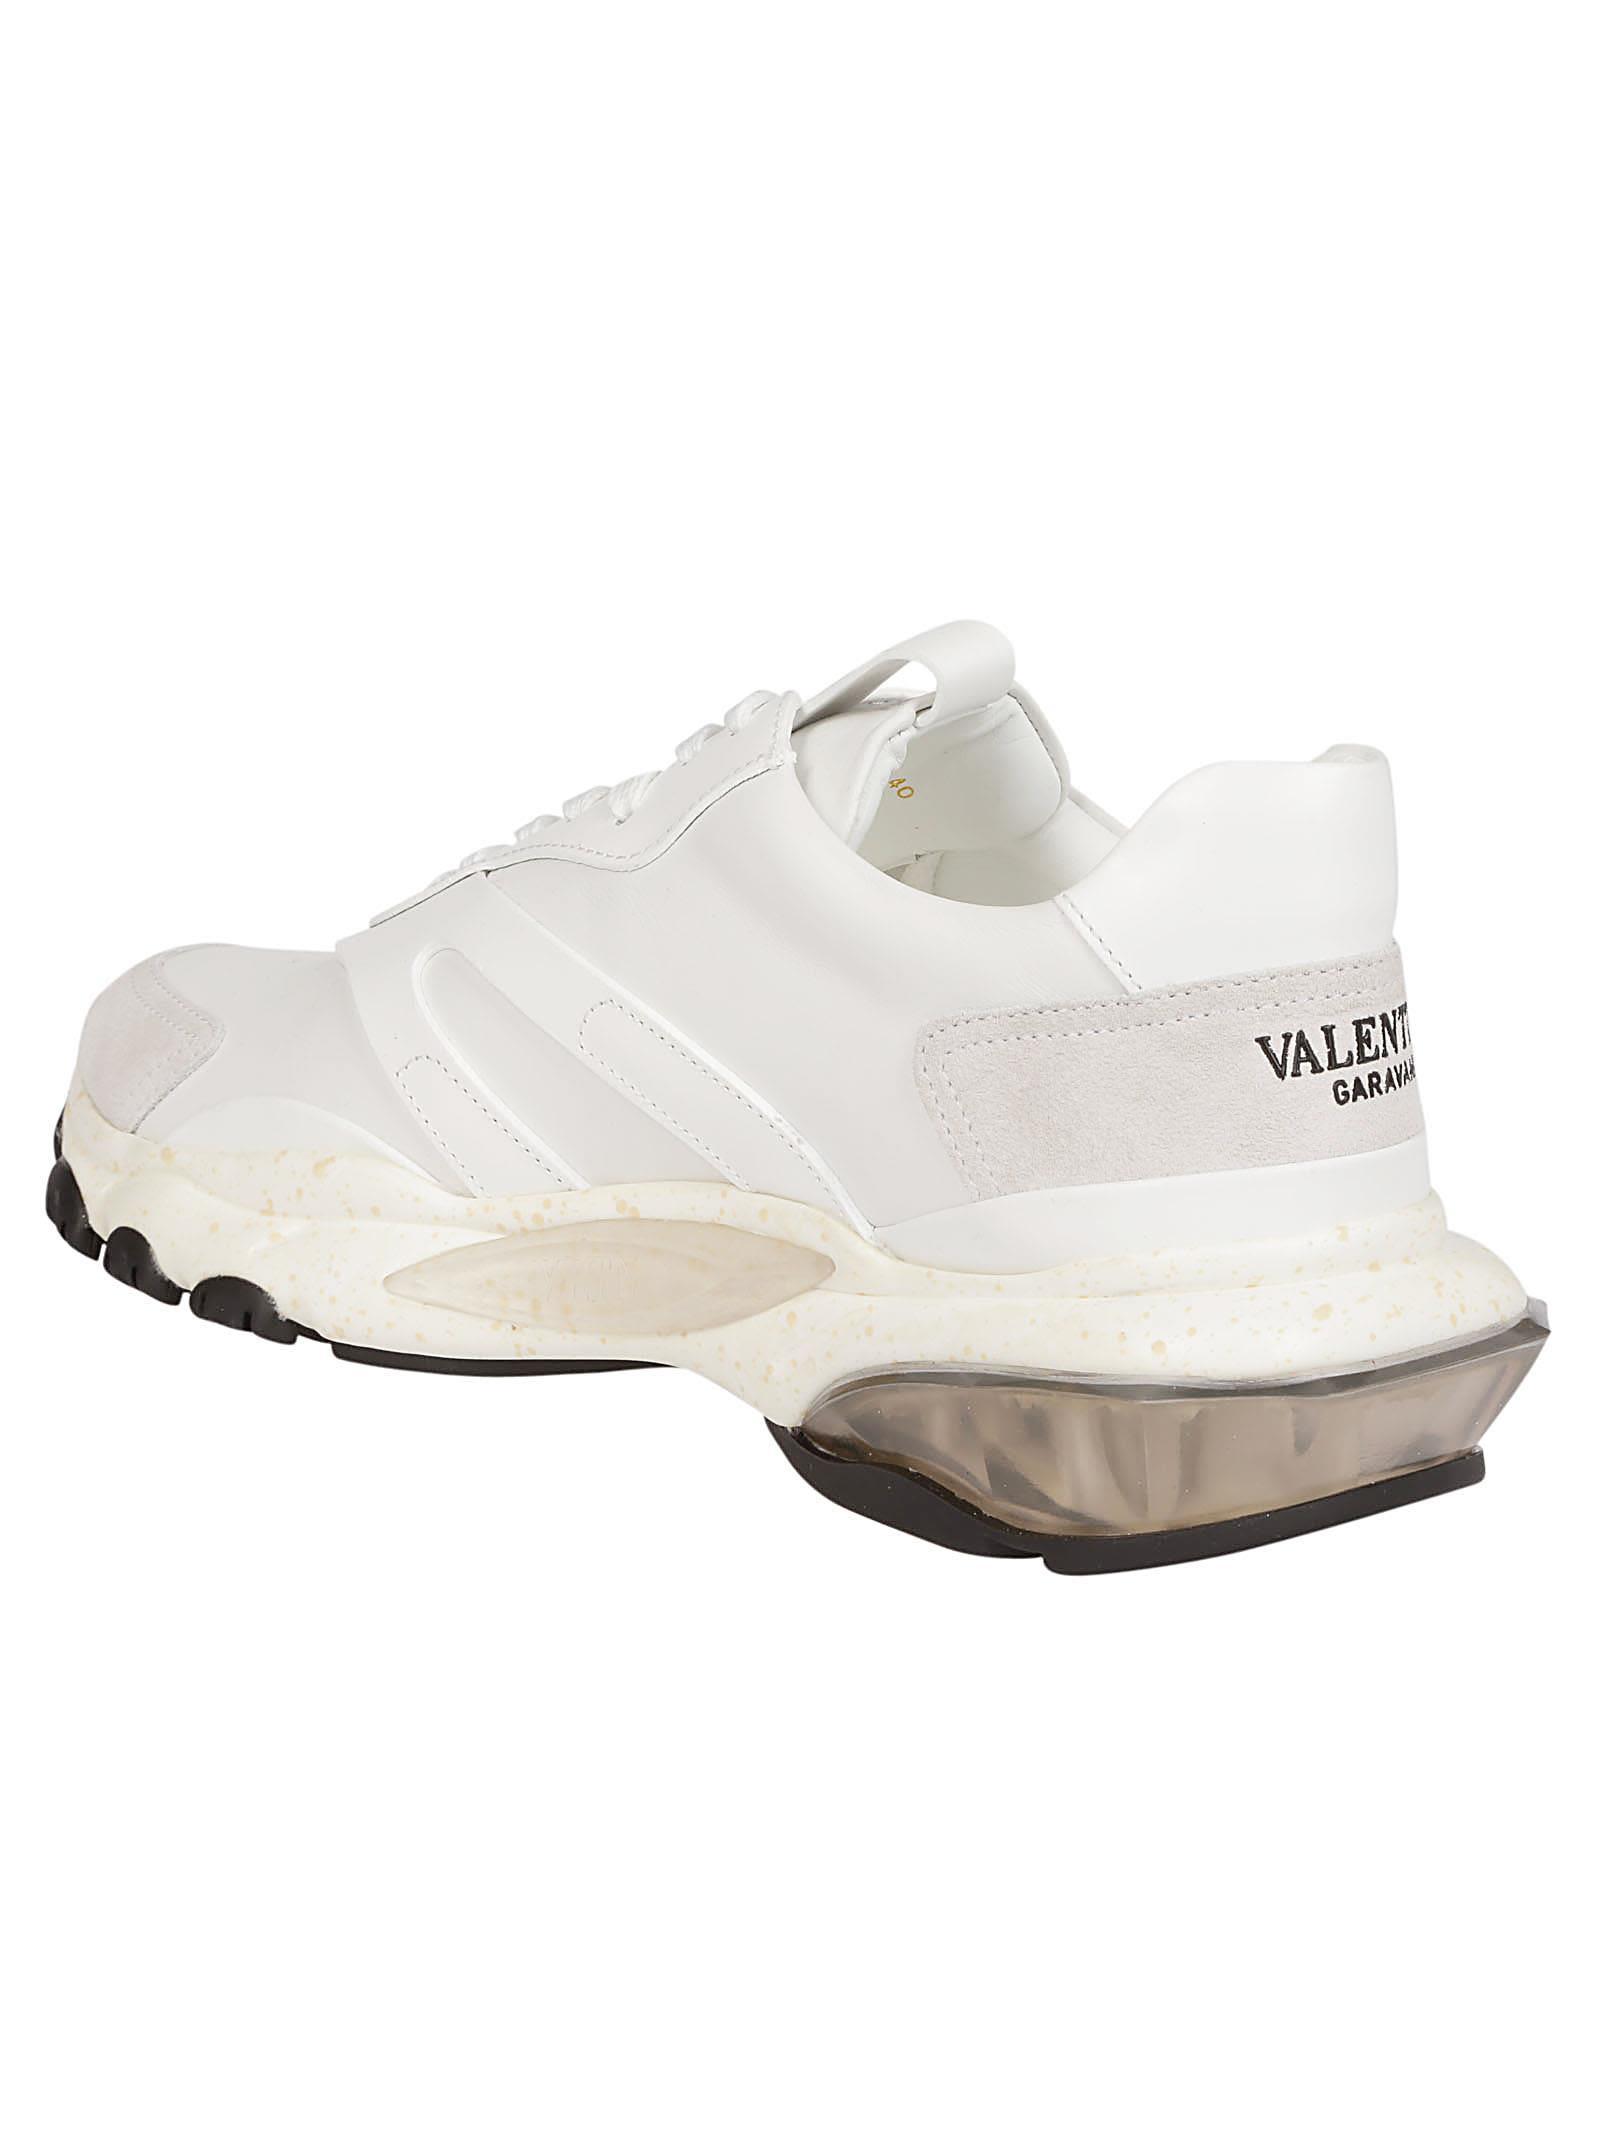 italist | Best price in the market for Valentino Valentino Garavani Bounce Sneakers - White ...